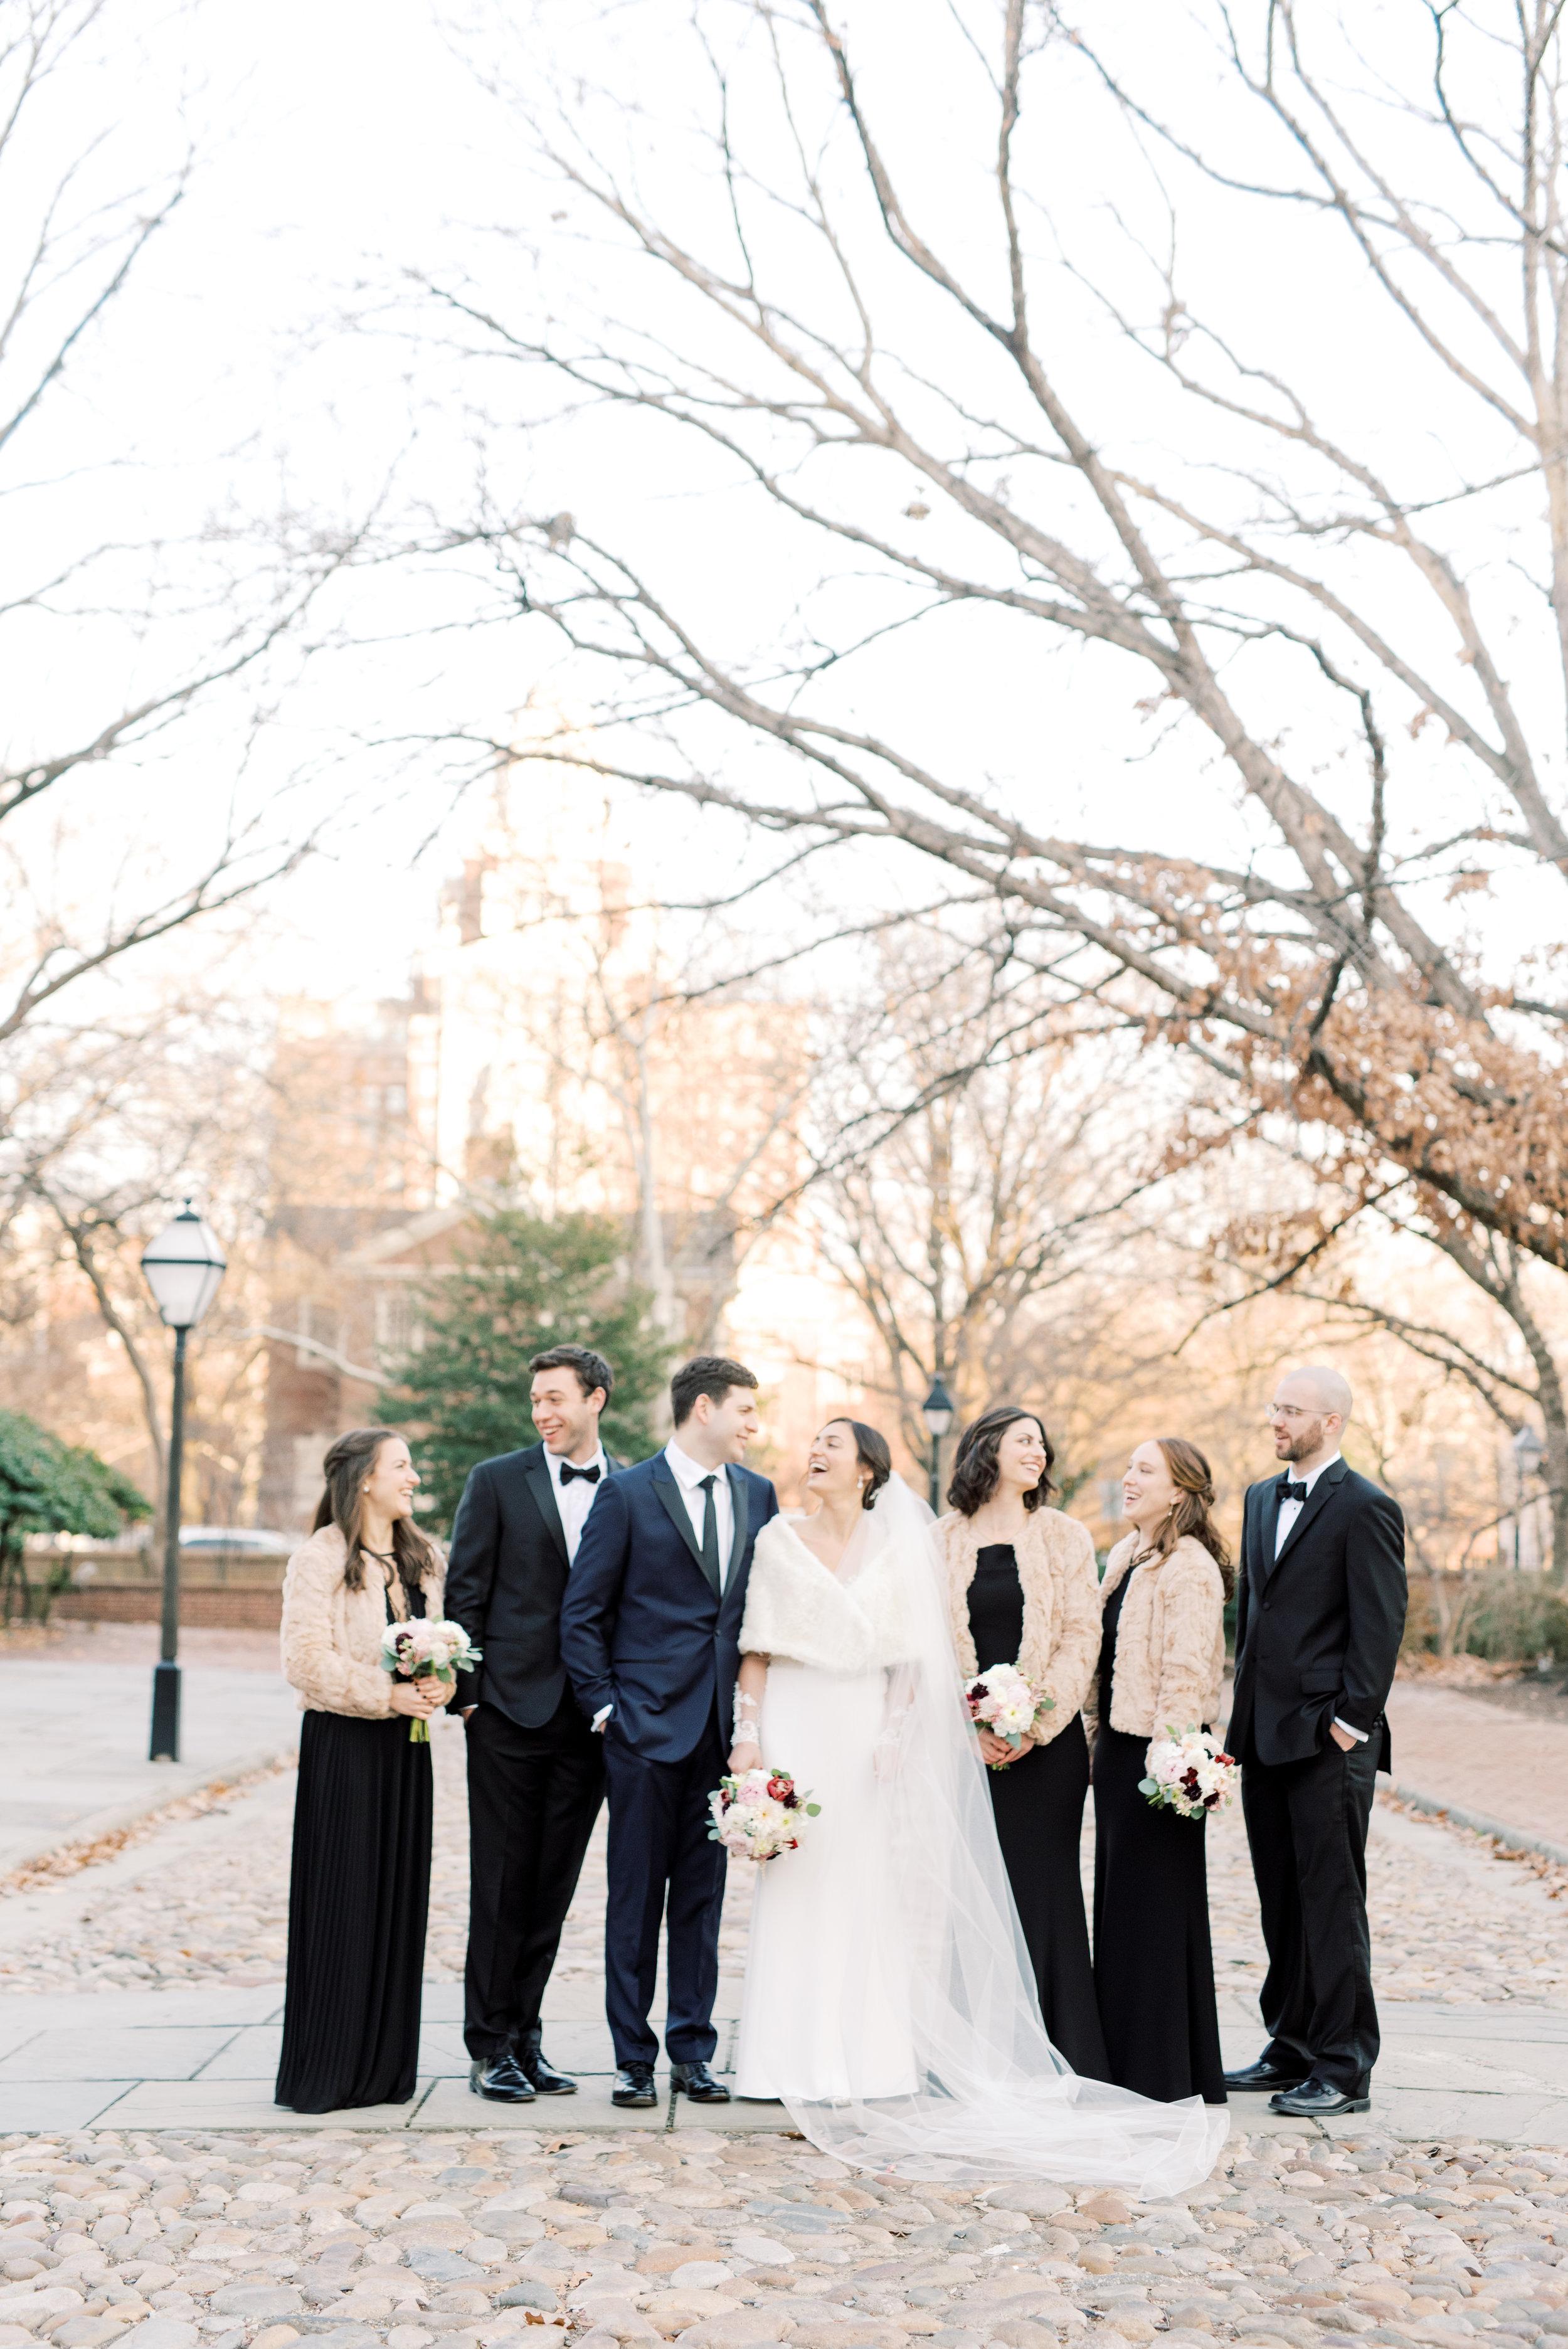 haley-richter-photography-classic-winter-union-trust-philadelphia-wedding-051.jpg